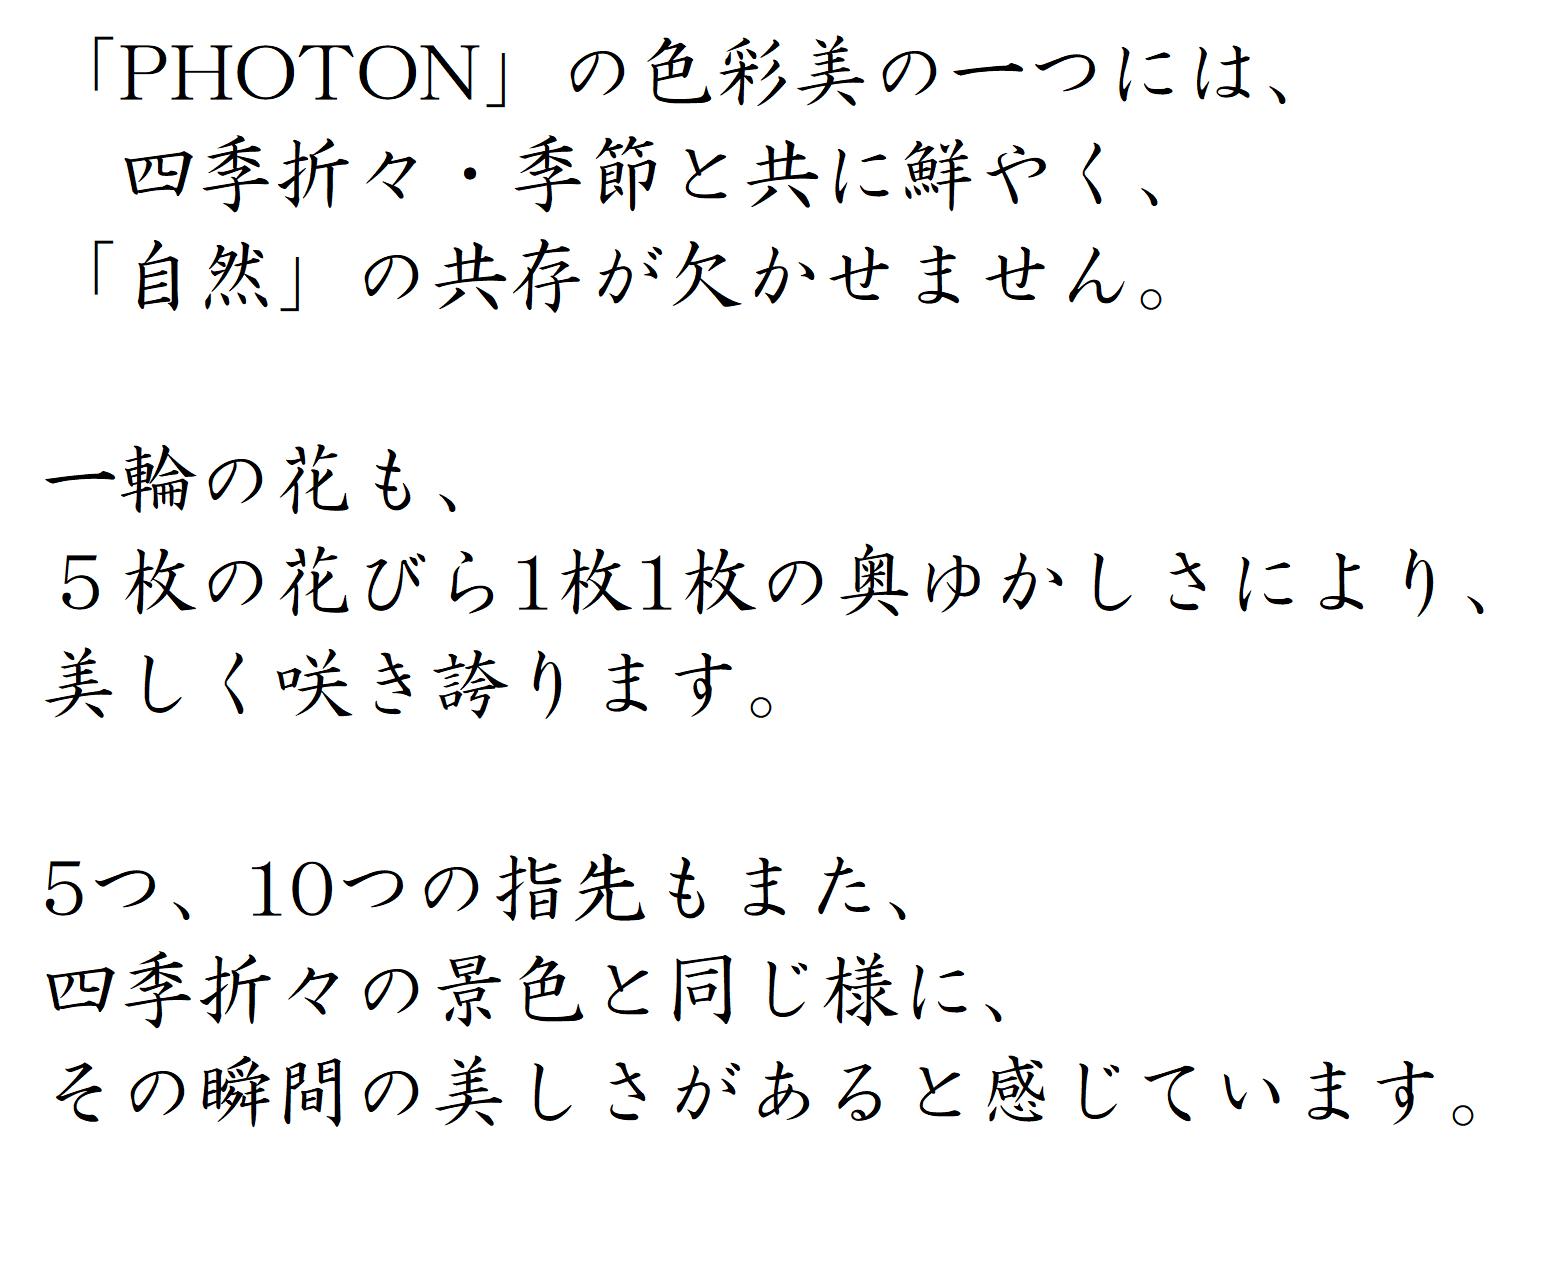 NAIL ARTIST コンセプト │ PHOTON ( フォトン )│private nail art lab Tokyo│ プライベート ネイル サロン │ 表参道 東京